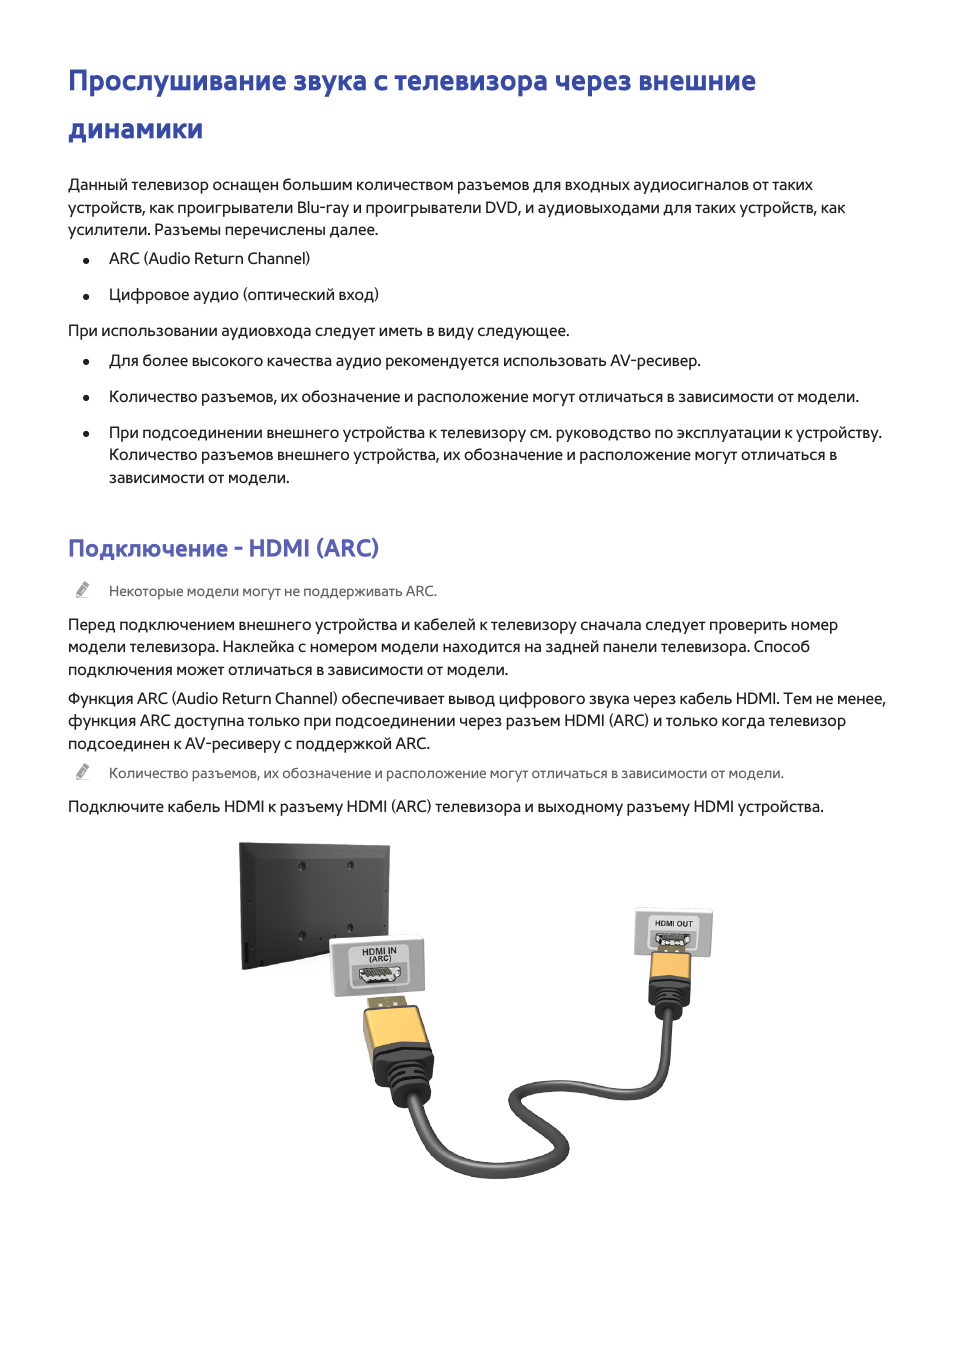 18 подключение - hdmi (arc), Подключение - hdmi (arc) Инструкция по эксплуатации Samsung UE55HU8700T Страница 24 / 240